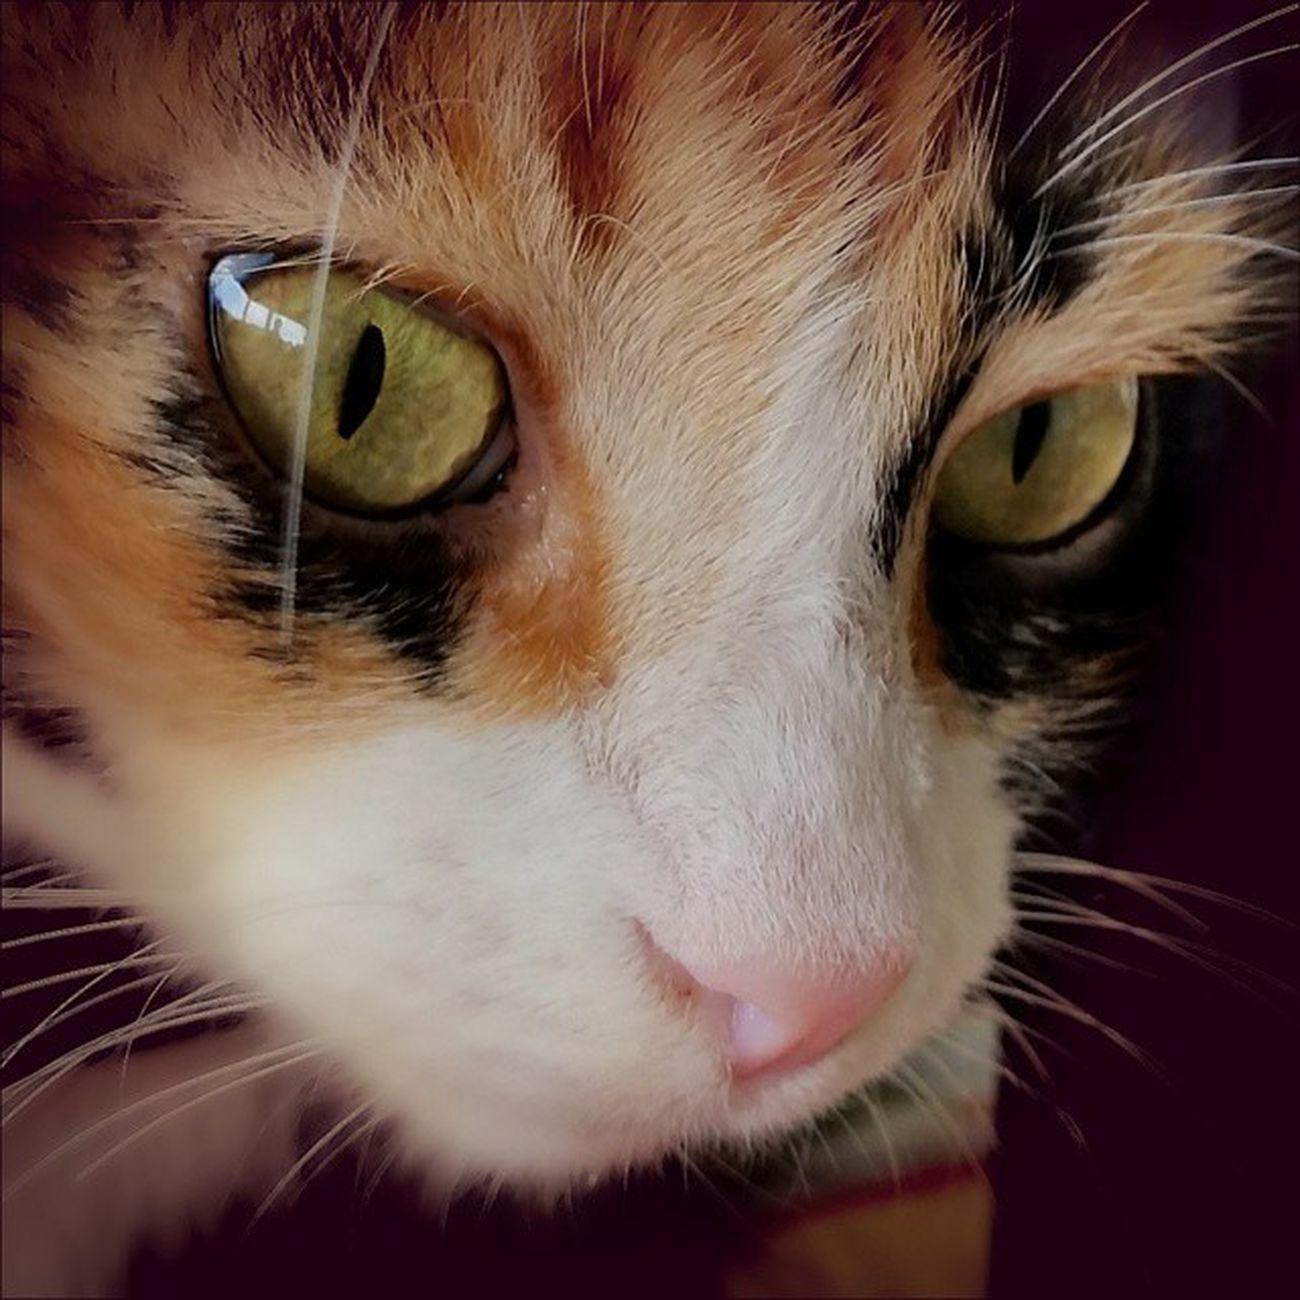 @ig_santanderes ,@ig.colombia , @ig_all_americas , @igworldclub , @ig_americas , @ig.latinoamerica , Cats , Igworldclub , Animals , Macro , Mascota , Miniño , Eyes , Petstagram , Gato Gato Gatos TagsPorMeGustas Gatosagram Instabueno Gatito Gatitos Mascota Mascotas Animal Animales Mascotagram FotoDelDia Gatoseninstagram Quieroamigato Instagatos naturaleza gatodeldia amoalosgatos peludo adorable